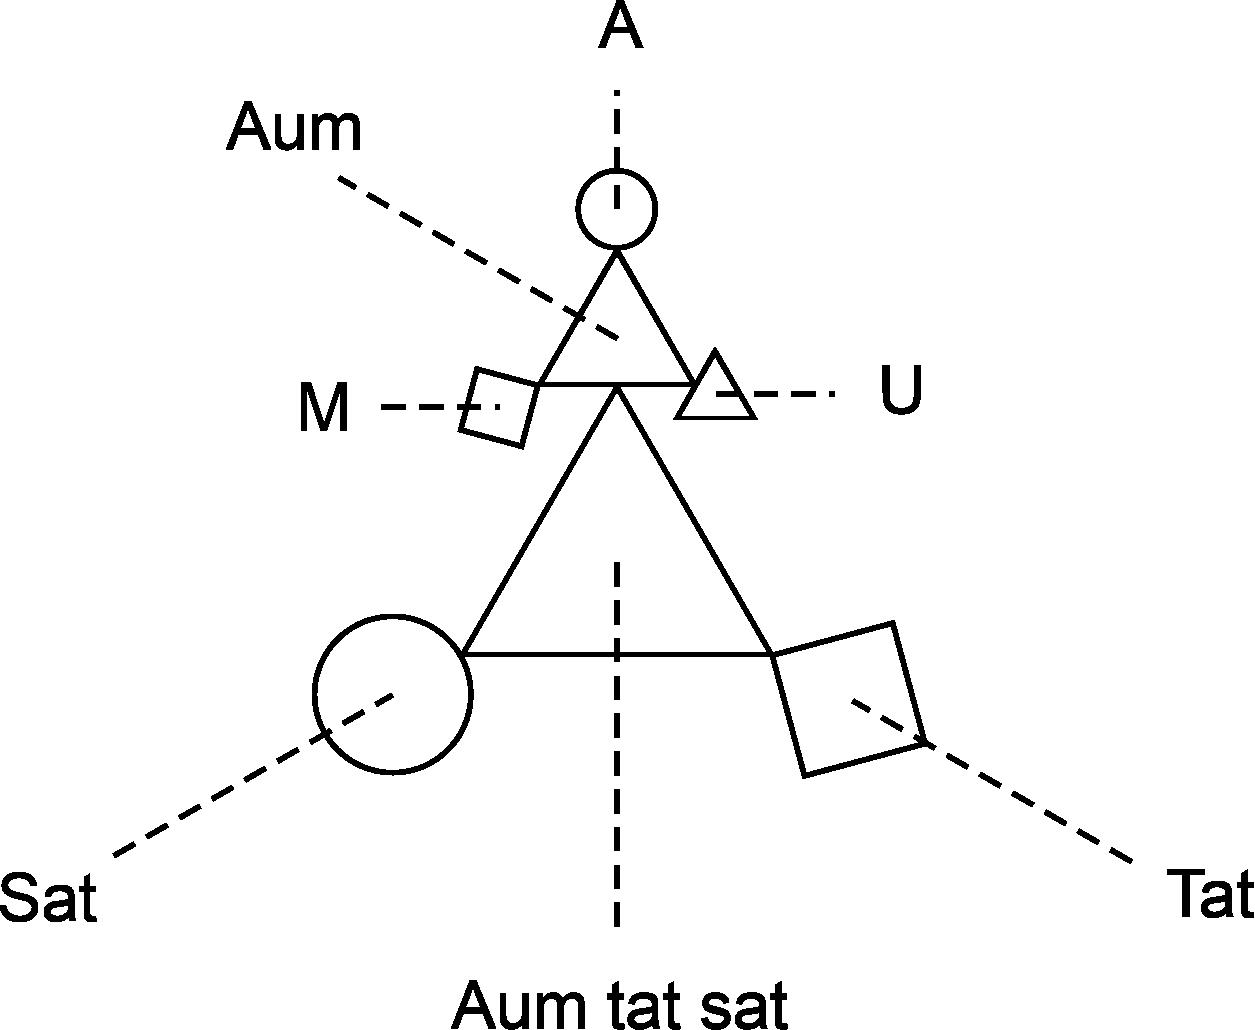 De fractalheid van 'aum tat sat'